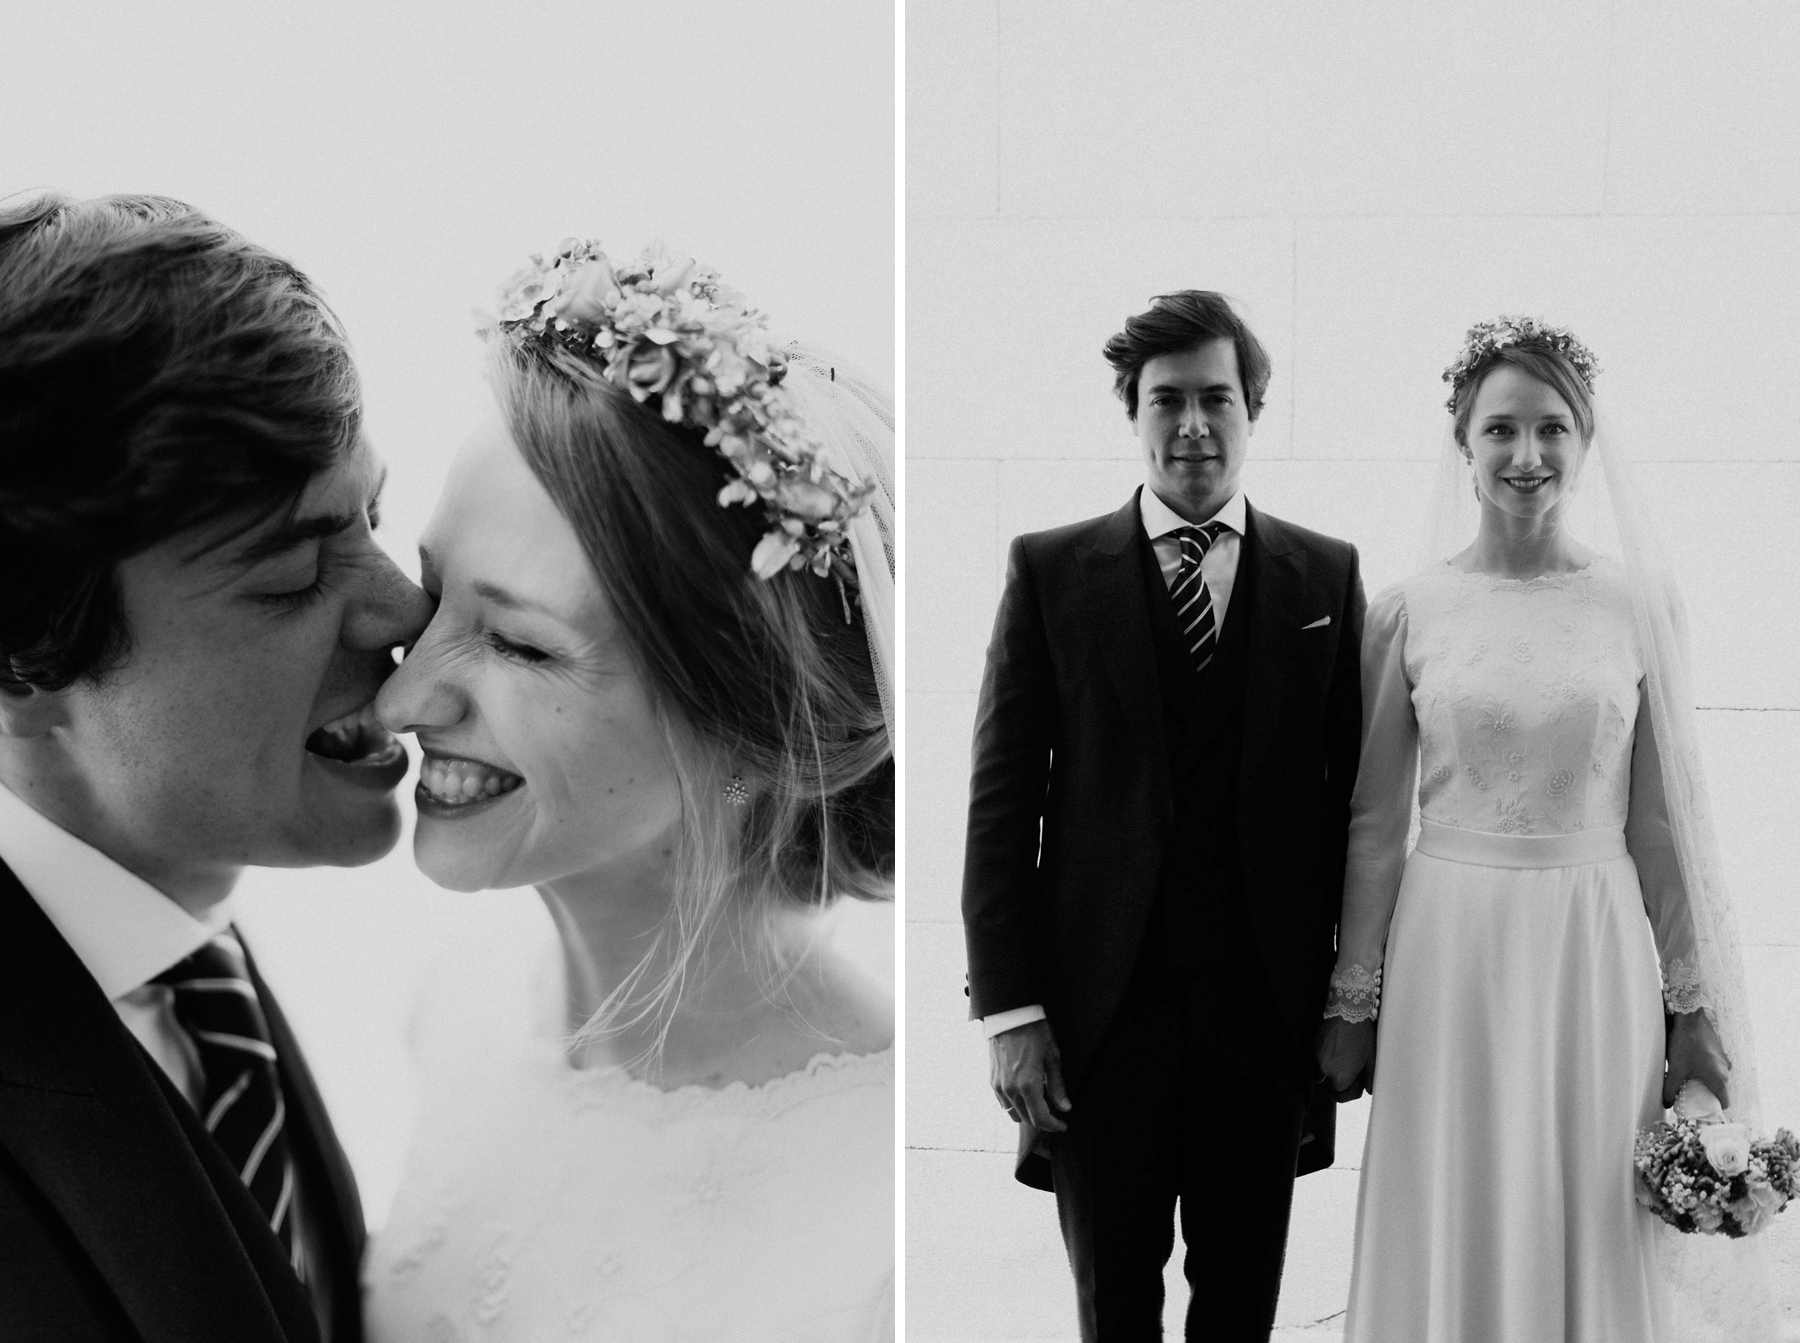 fotografo de bodas Jairo Crena-129